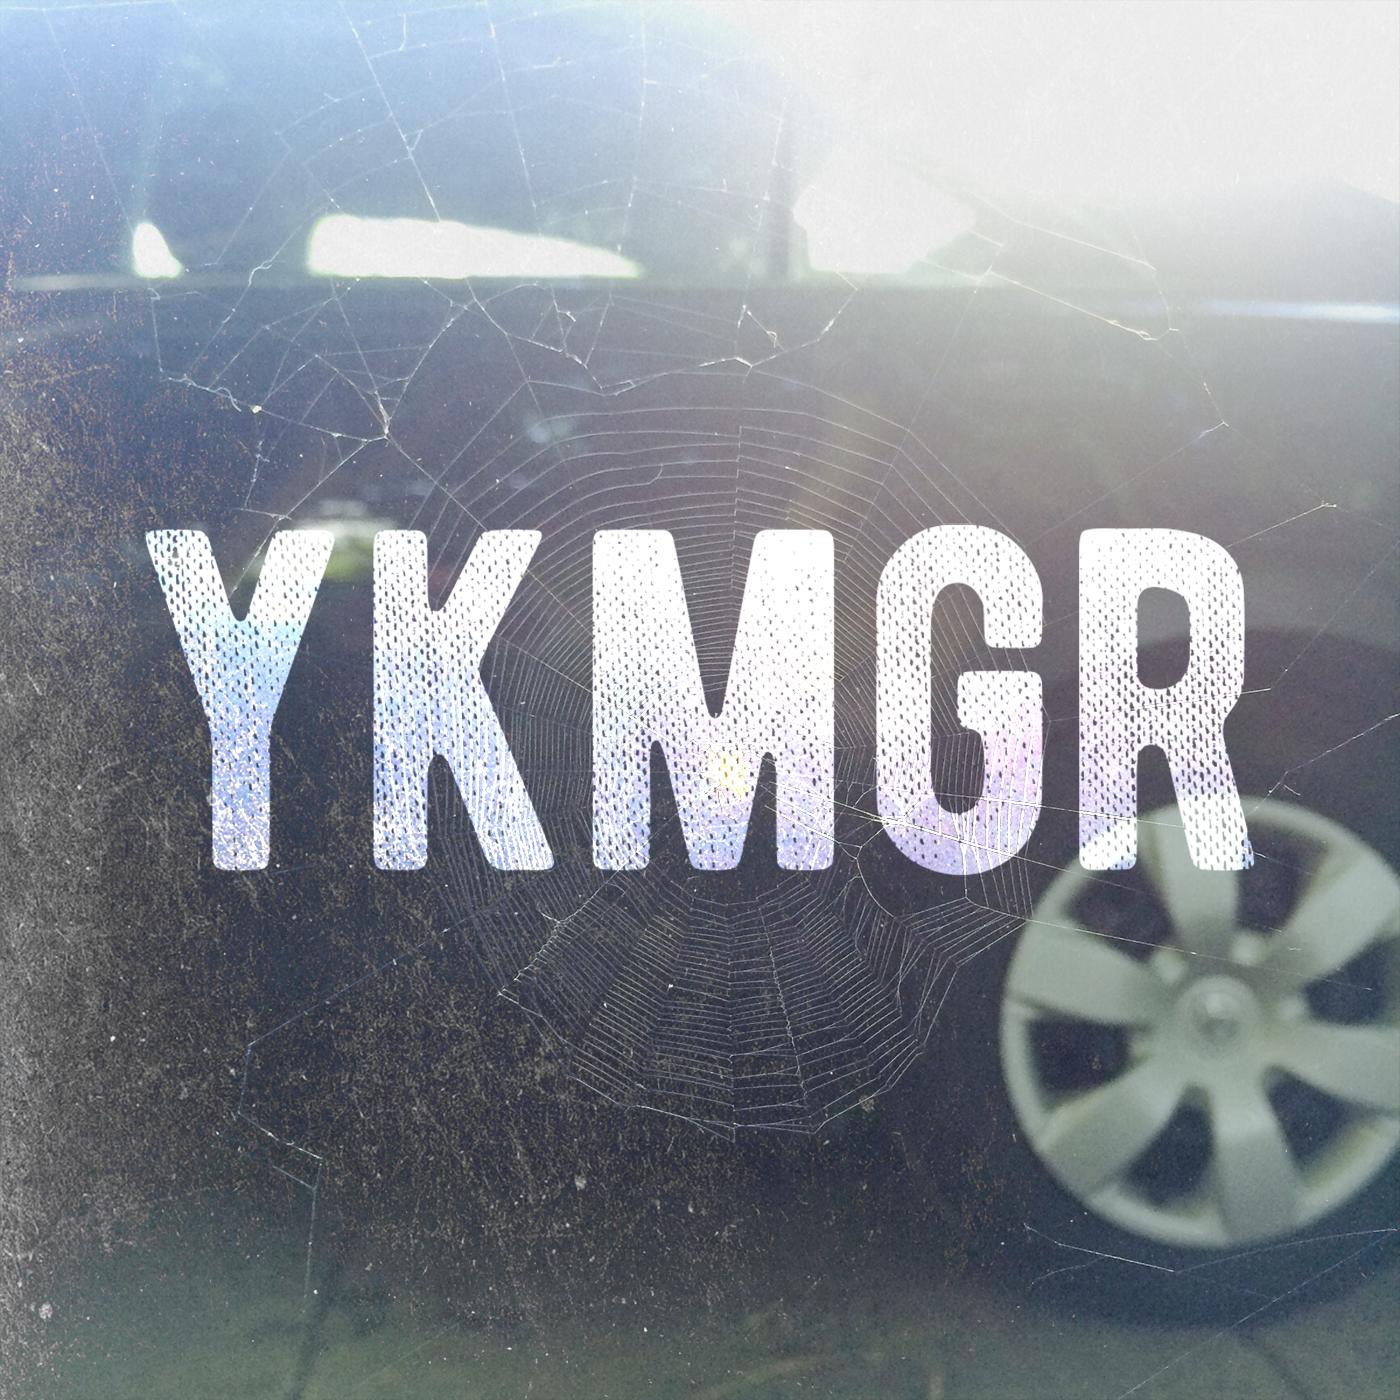 YKMGR 13.png